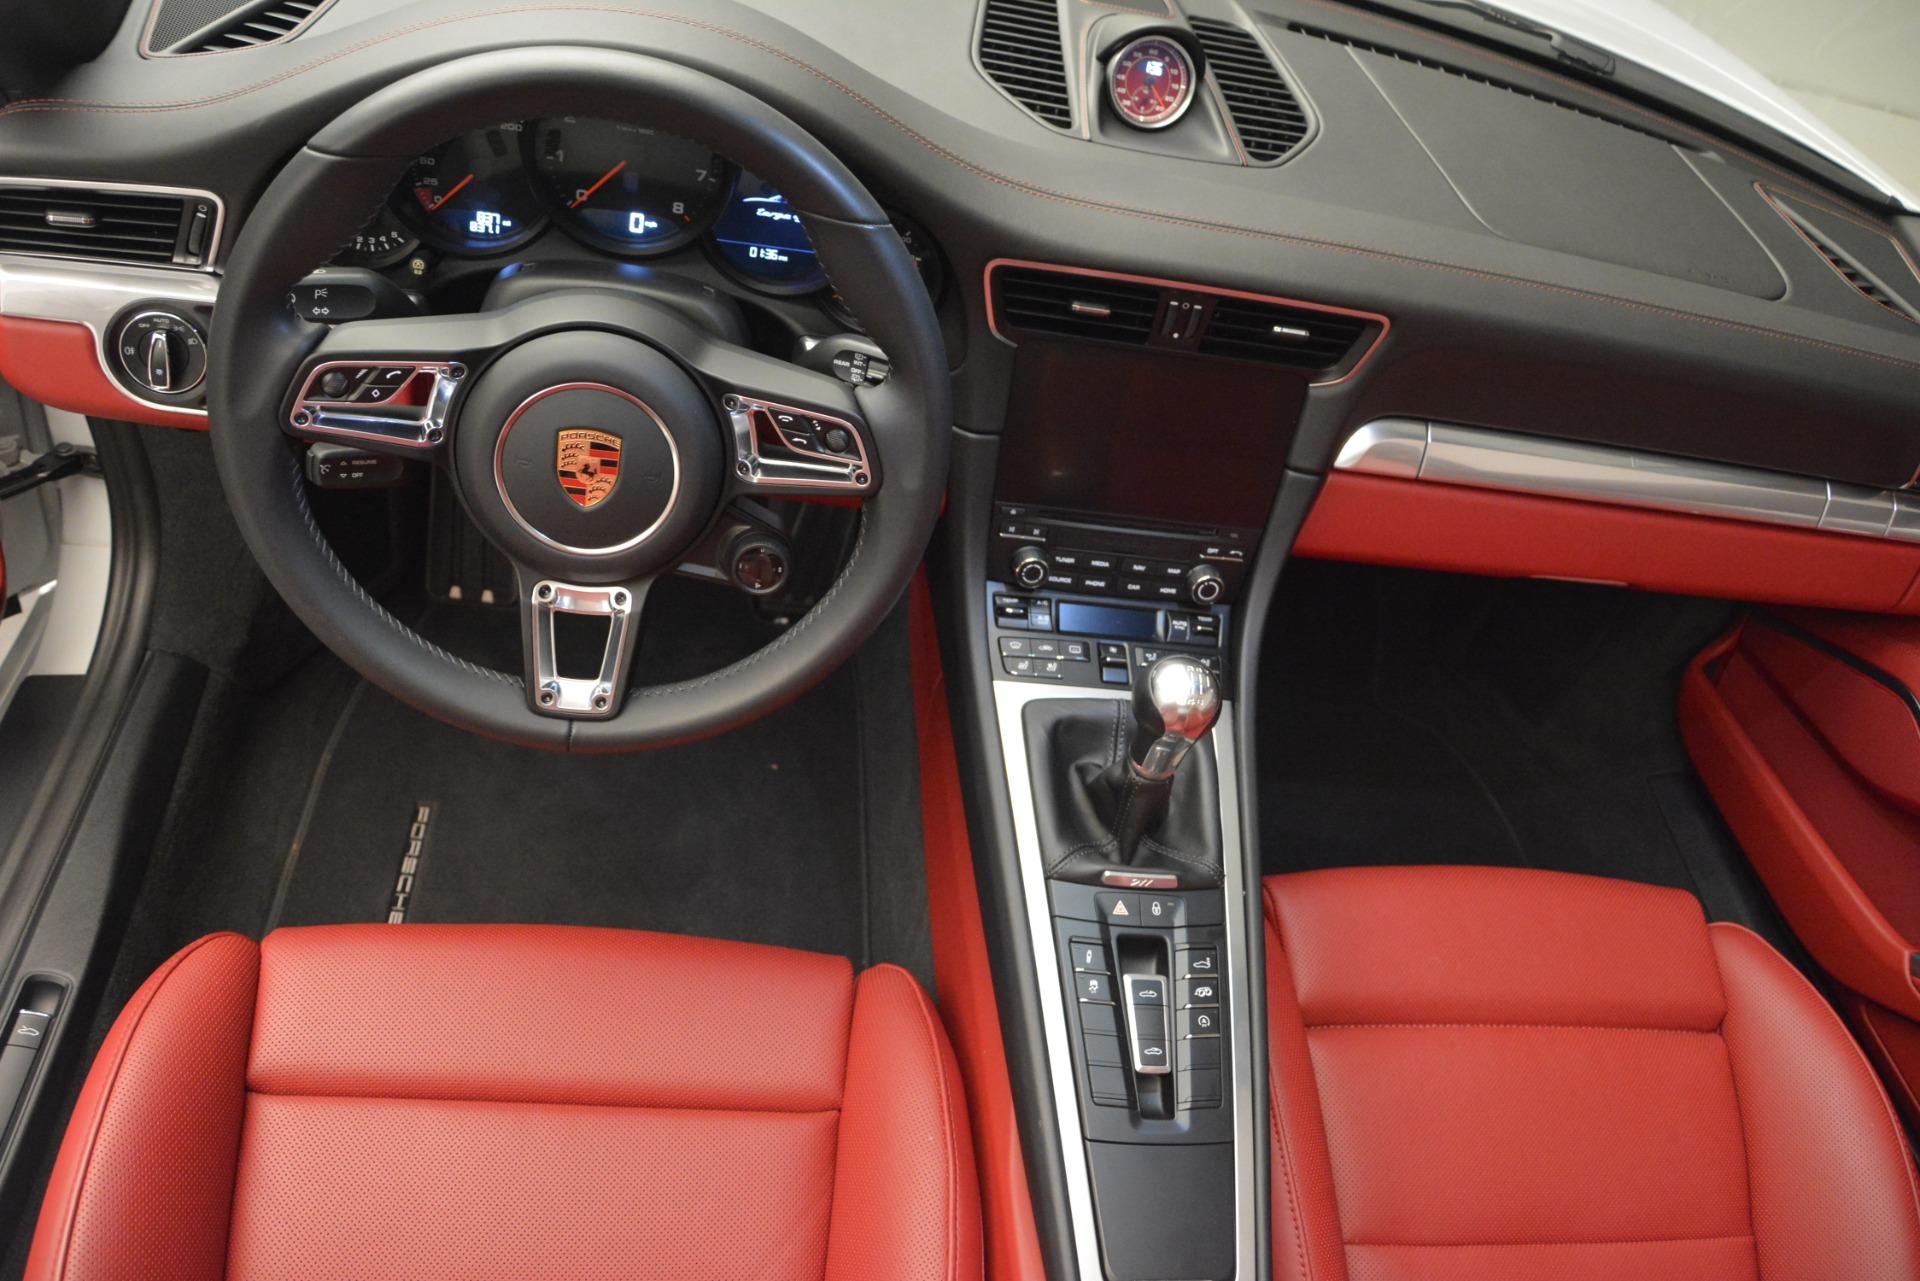 Used 2017 Porsche 911 Targa 4S For Sale In Greenwich, CT 2593_p14